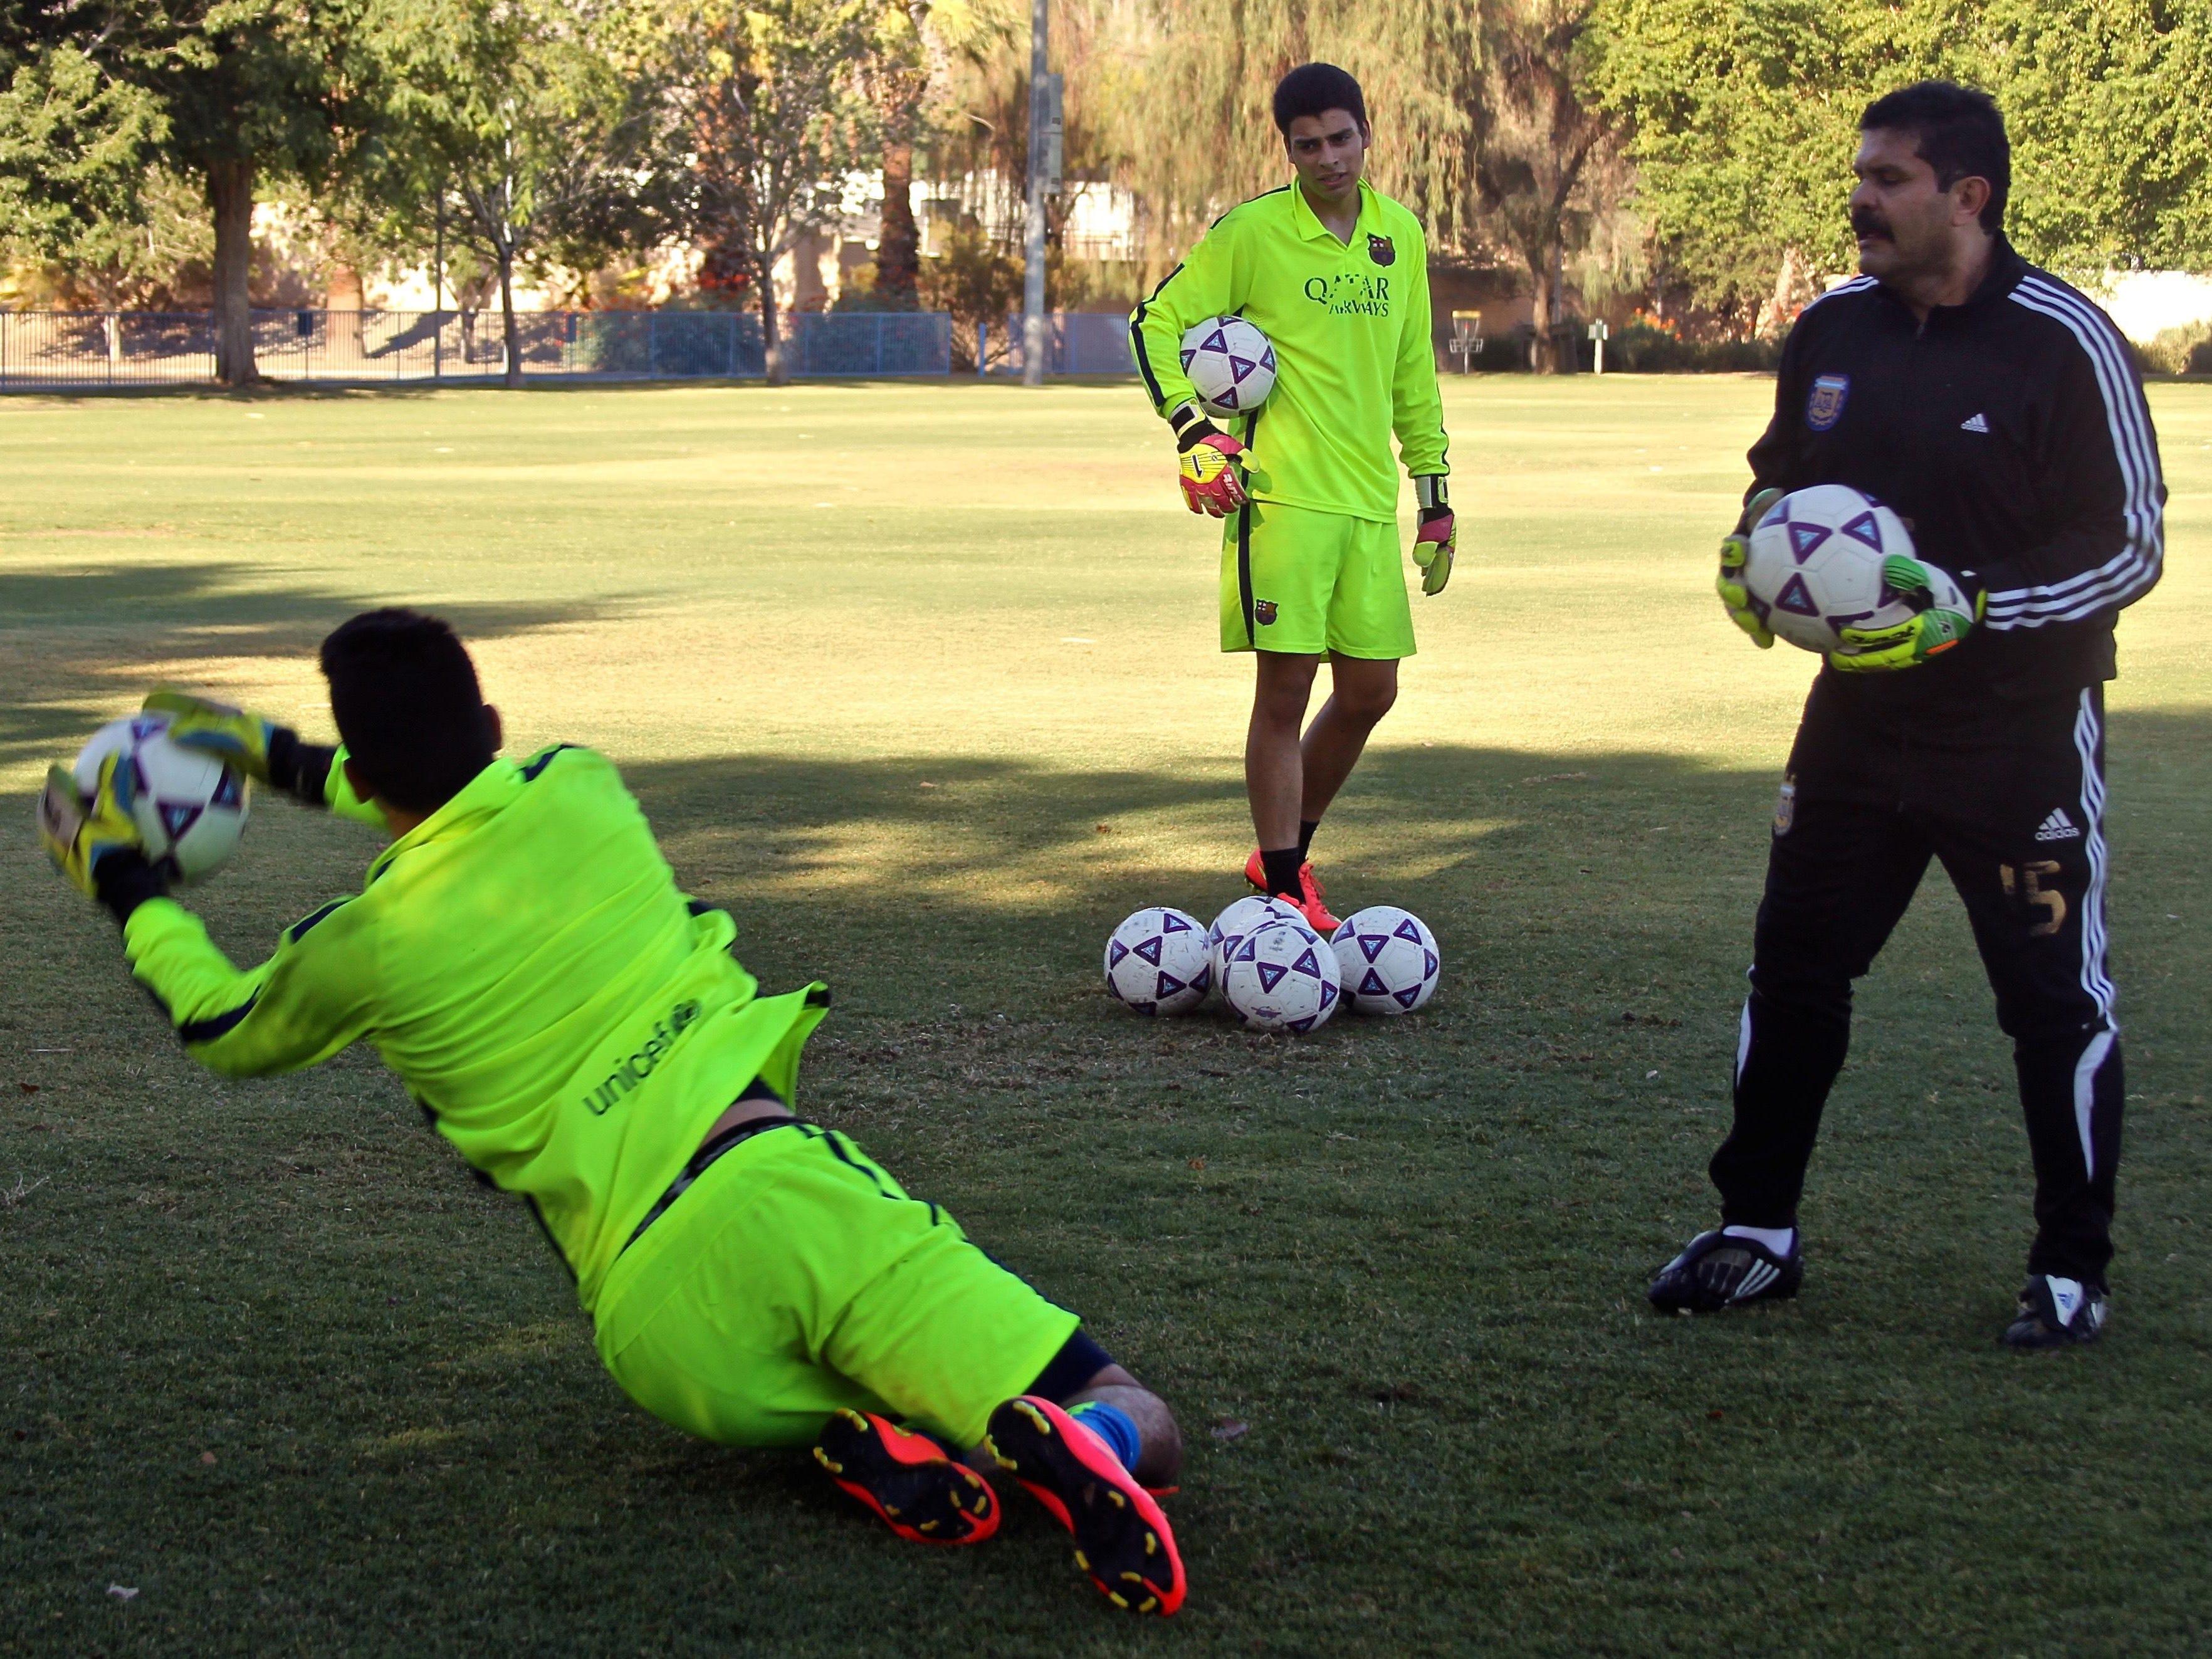 Goalkeeper trainer Carlos Serrato observes Daniel Rivera blocking a kick, Tuesday, at the Hovley Soccer Park in Palm Desert.